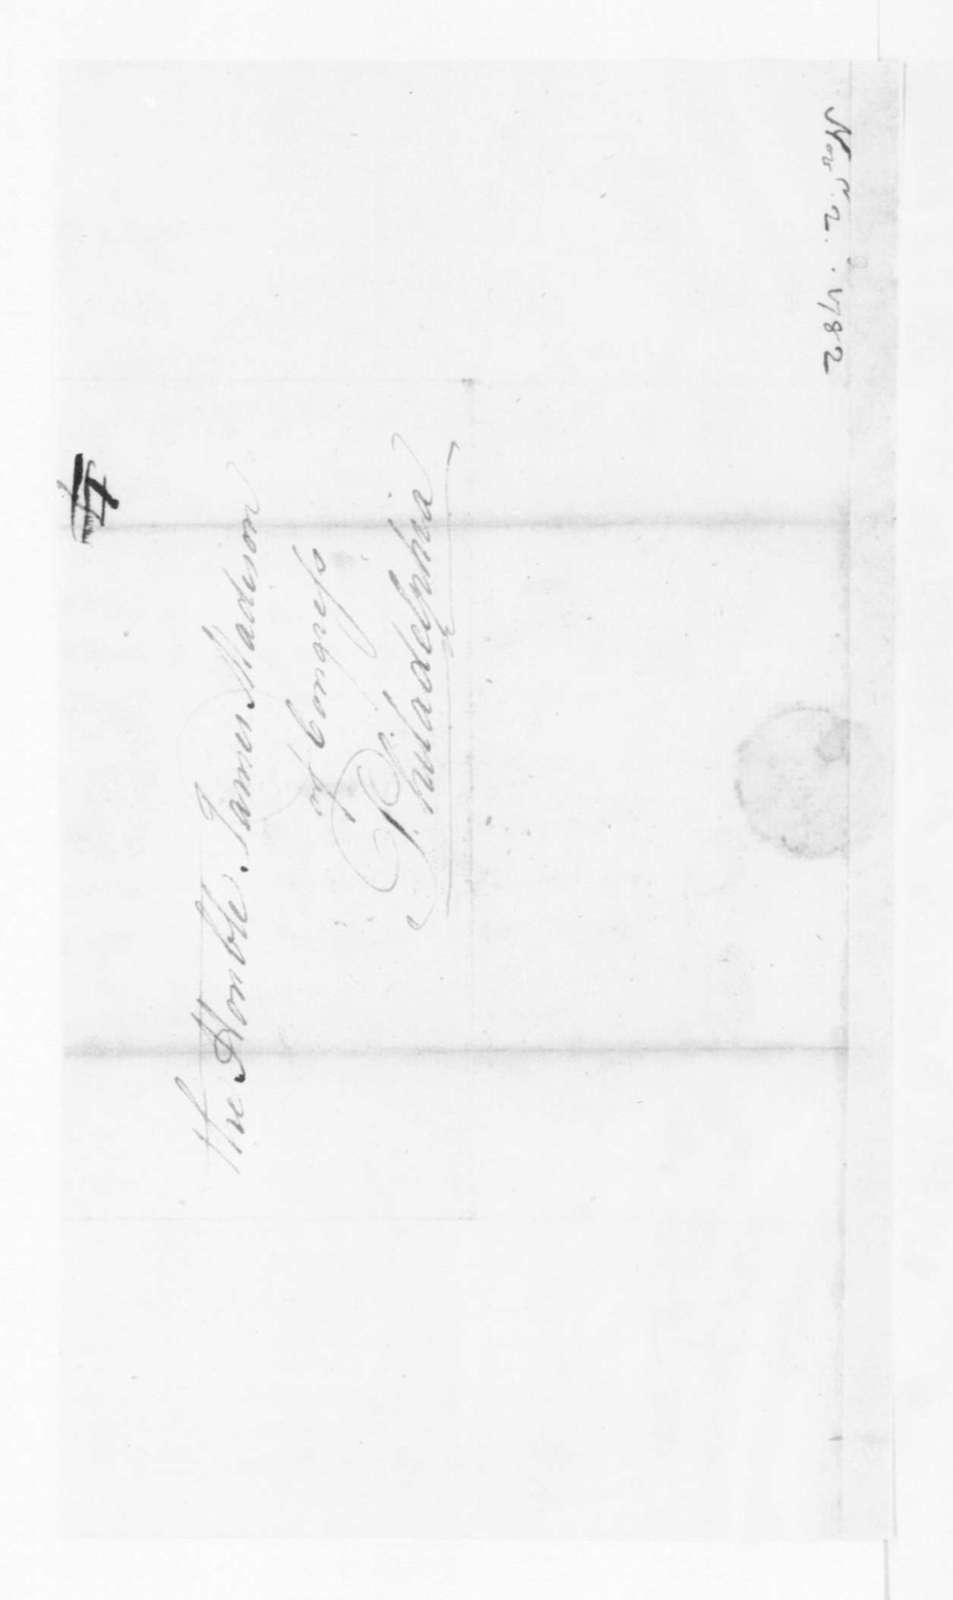 Edmund Randolph to James Madison, November 2, 1782.